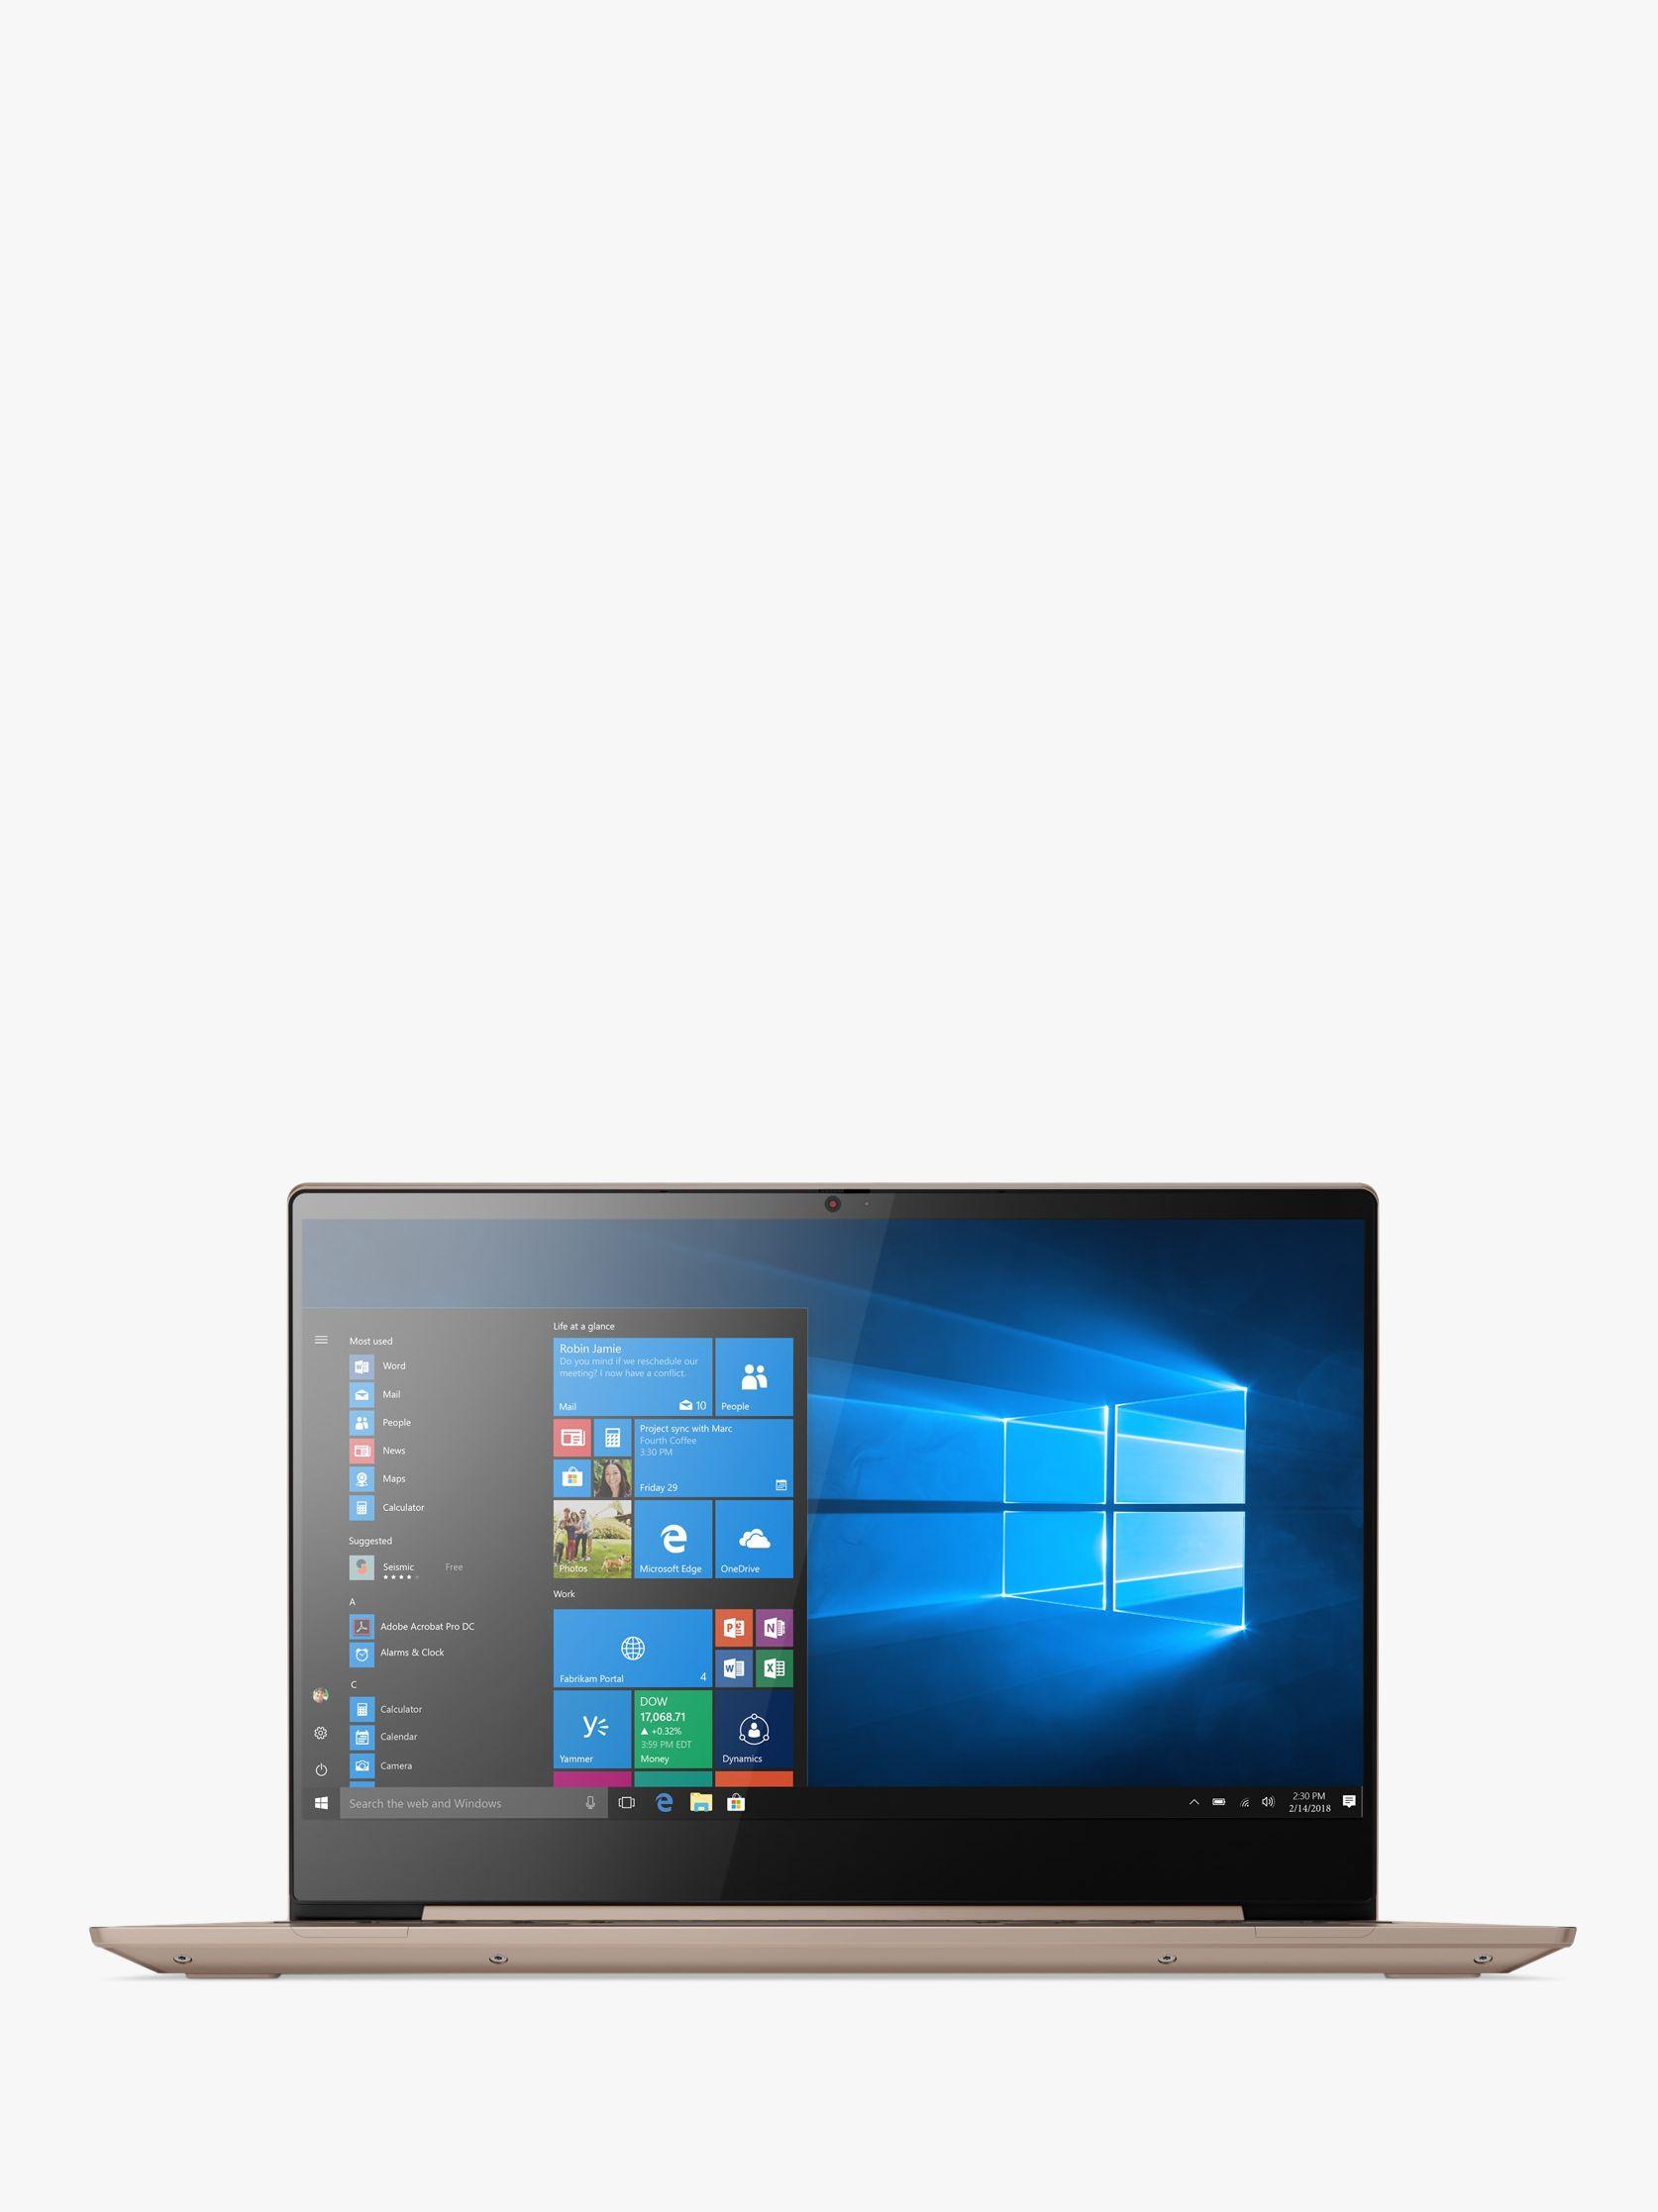 Lenovo Lenovo IdeaPad S540-14IWL Laptop, Intel Core i7 Processor, 8GB RAM, 512GB SSD, 14 Full HD, Rose Gold